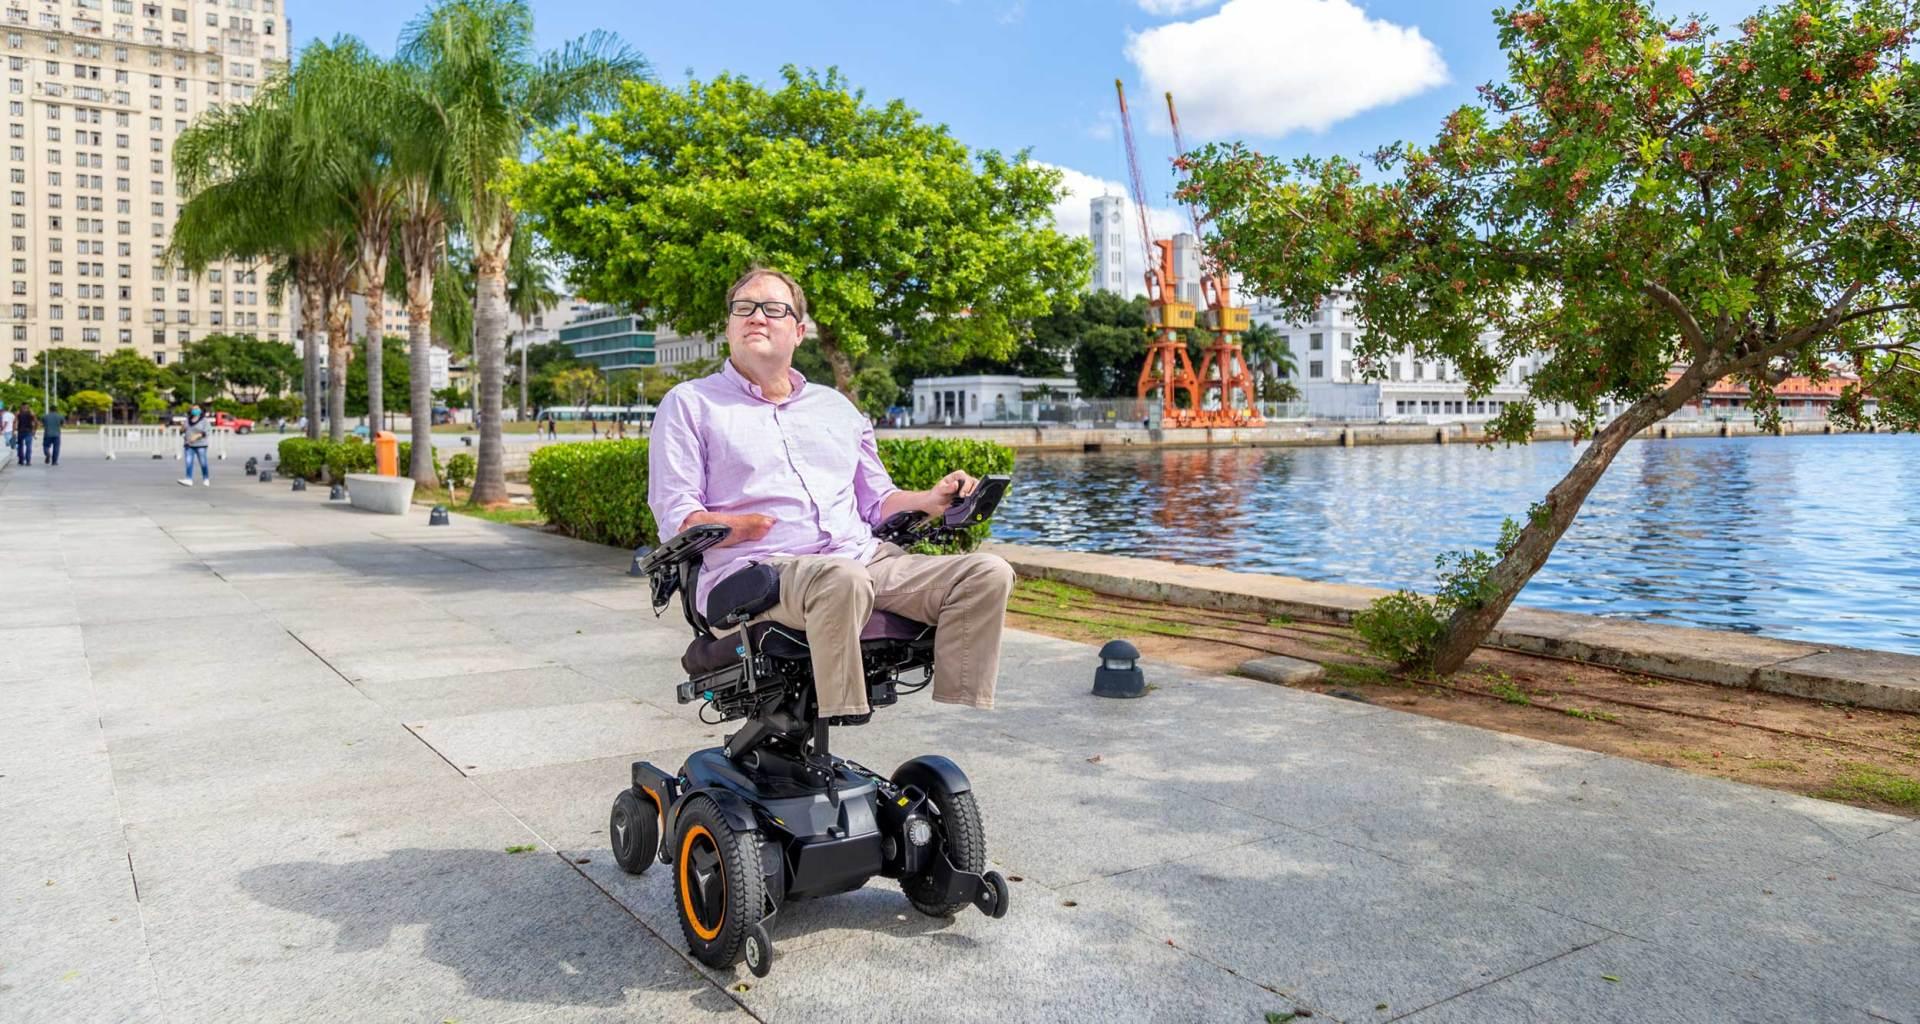 John rolling in his wheelchair in the Centro district of Rio de Janeiro.